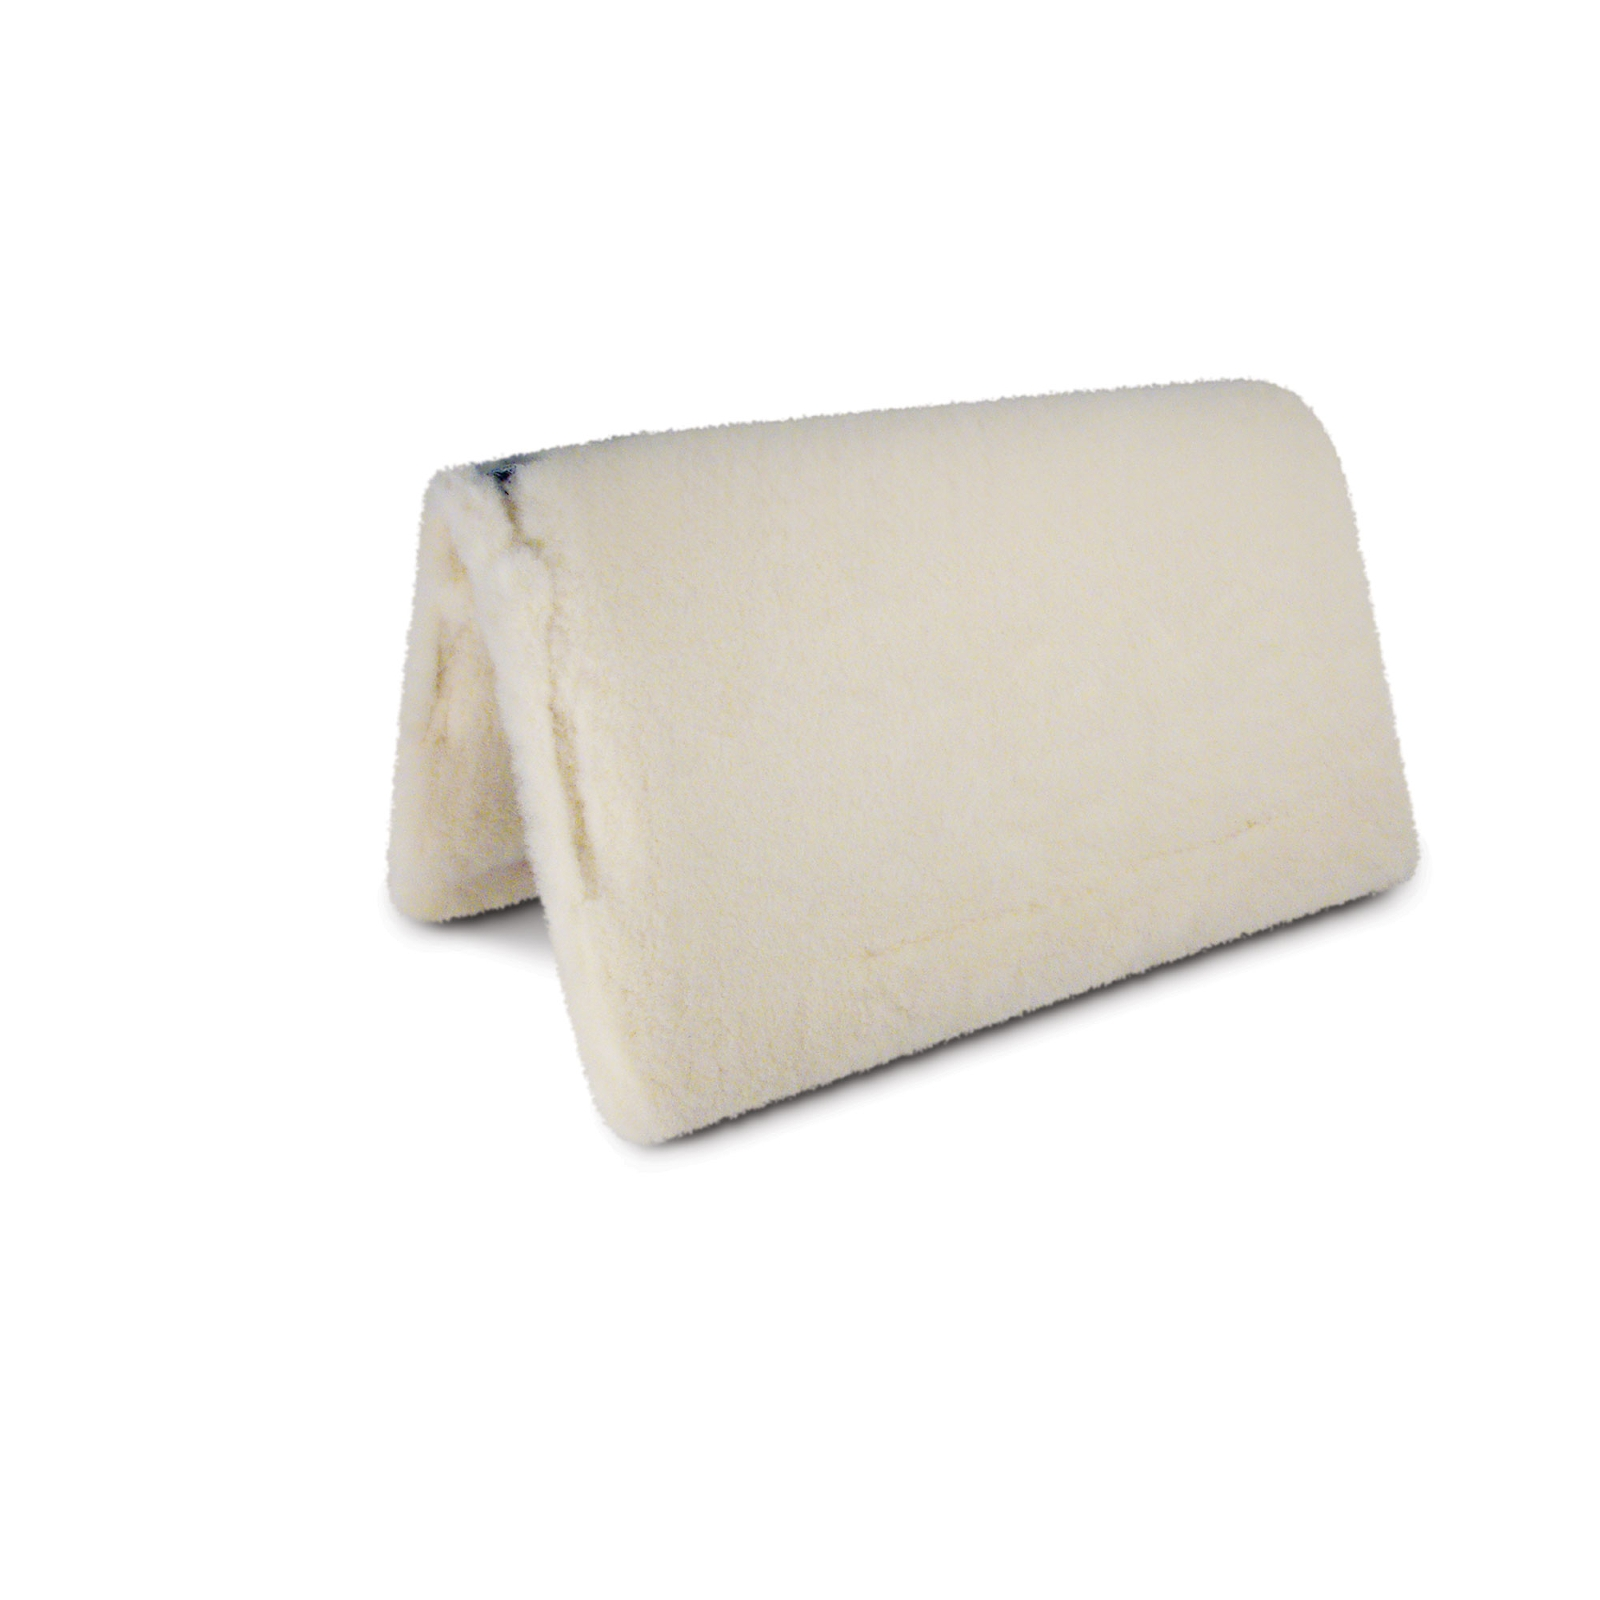 Toklat WoolBack Pack Saddle Pad with Felt Insert